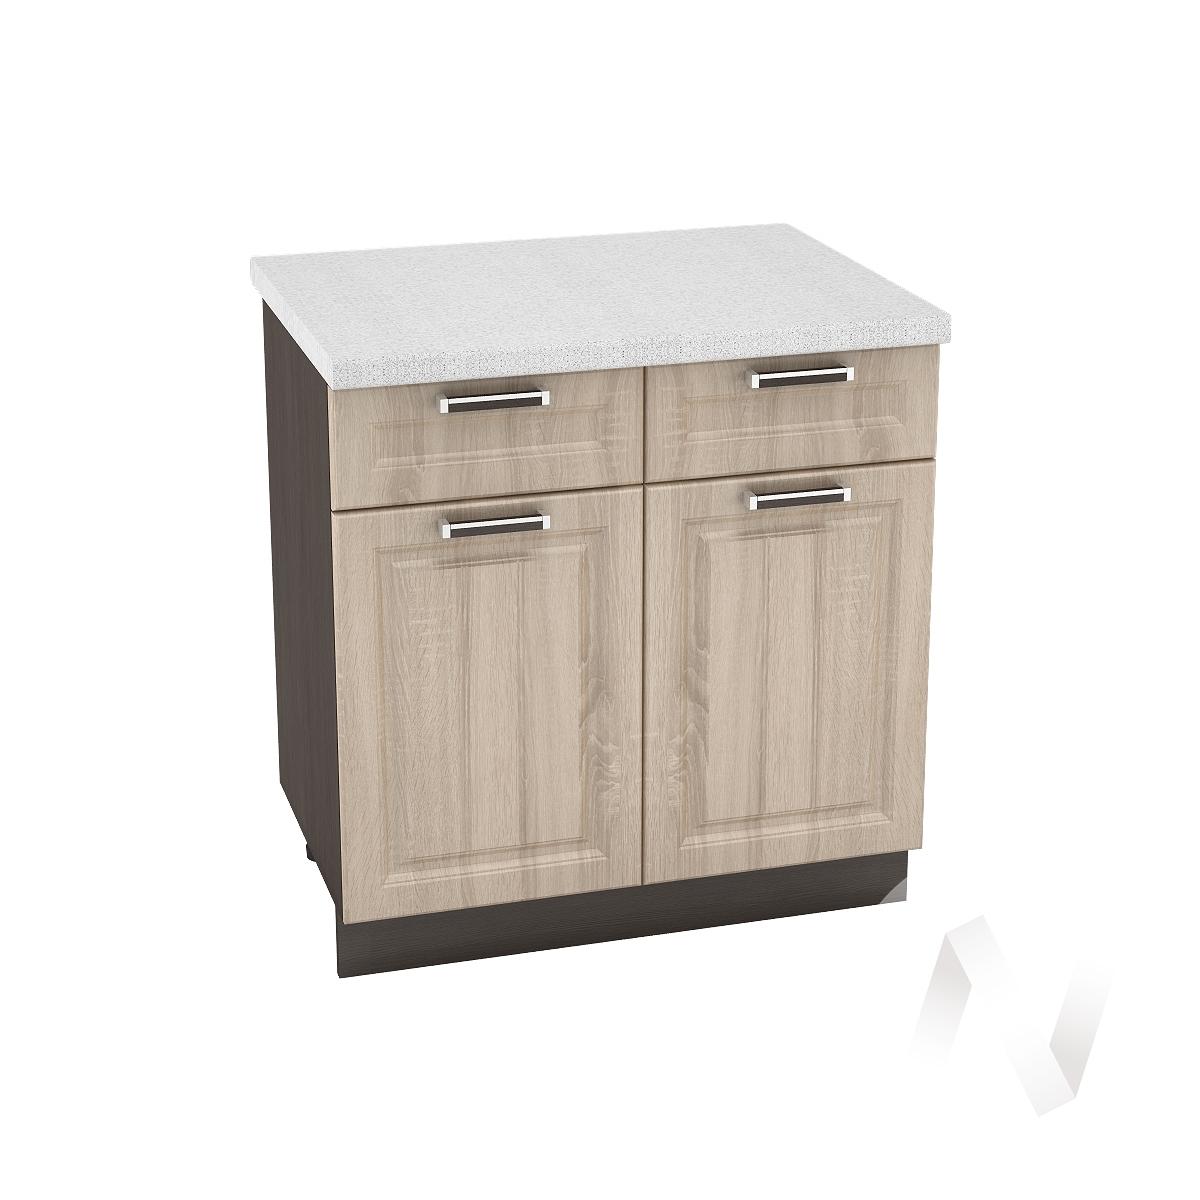 "Кухня ""Прага"": Шкаф нижний с ящиками 800, ШН1Я 800 (дуб сонома/корпус венге)"